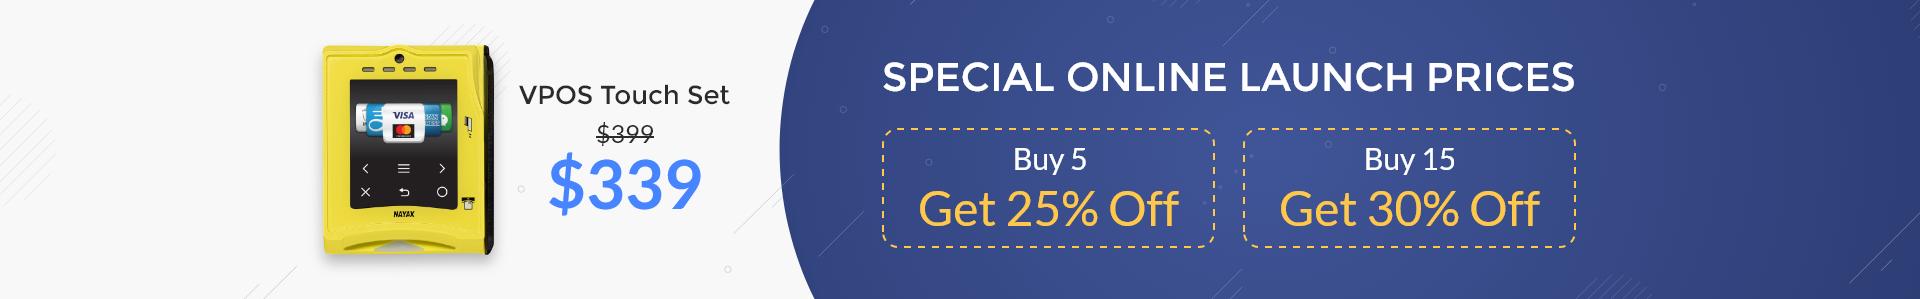 Special Online Launch Prices - Buy 5 Get 25% Off, Buy 15 Get 30% Off